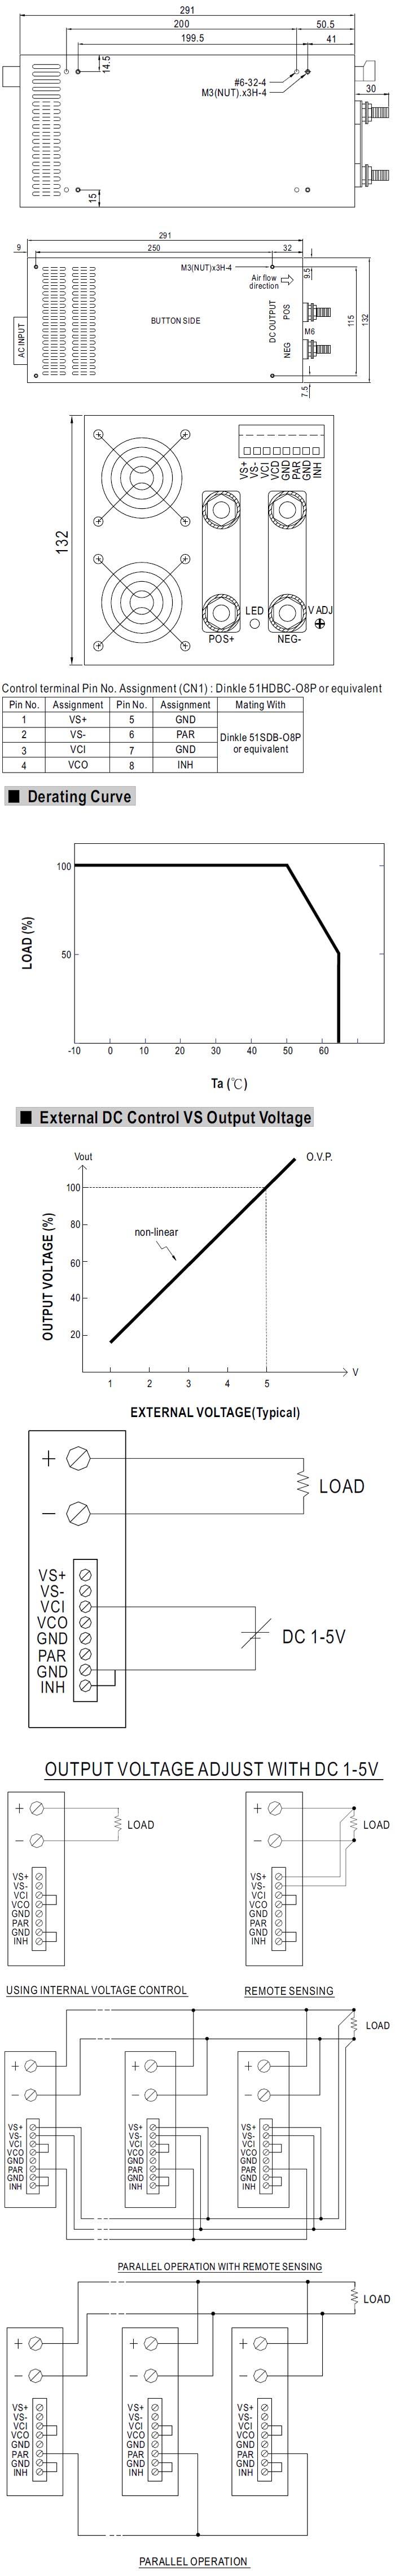 输入ac220v,输出dc27v,电流55a,最大功率1500w.